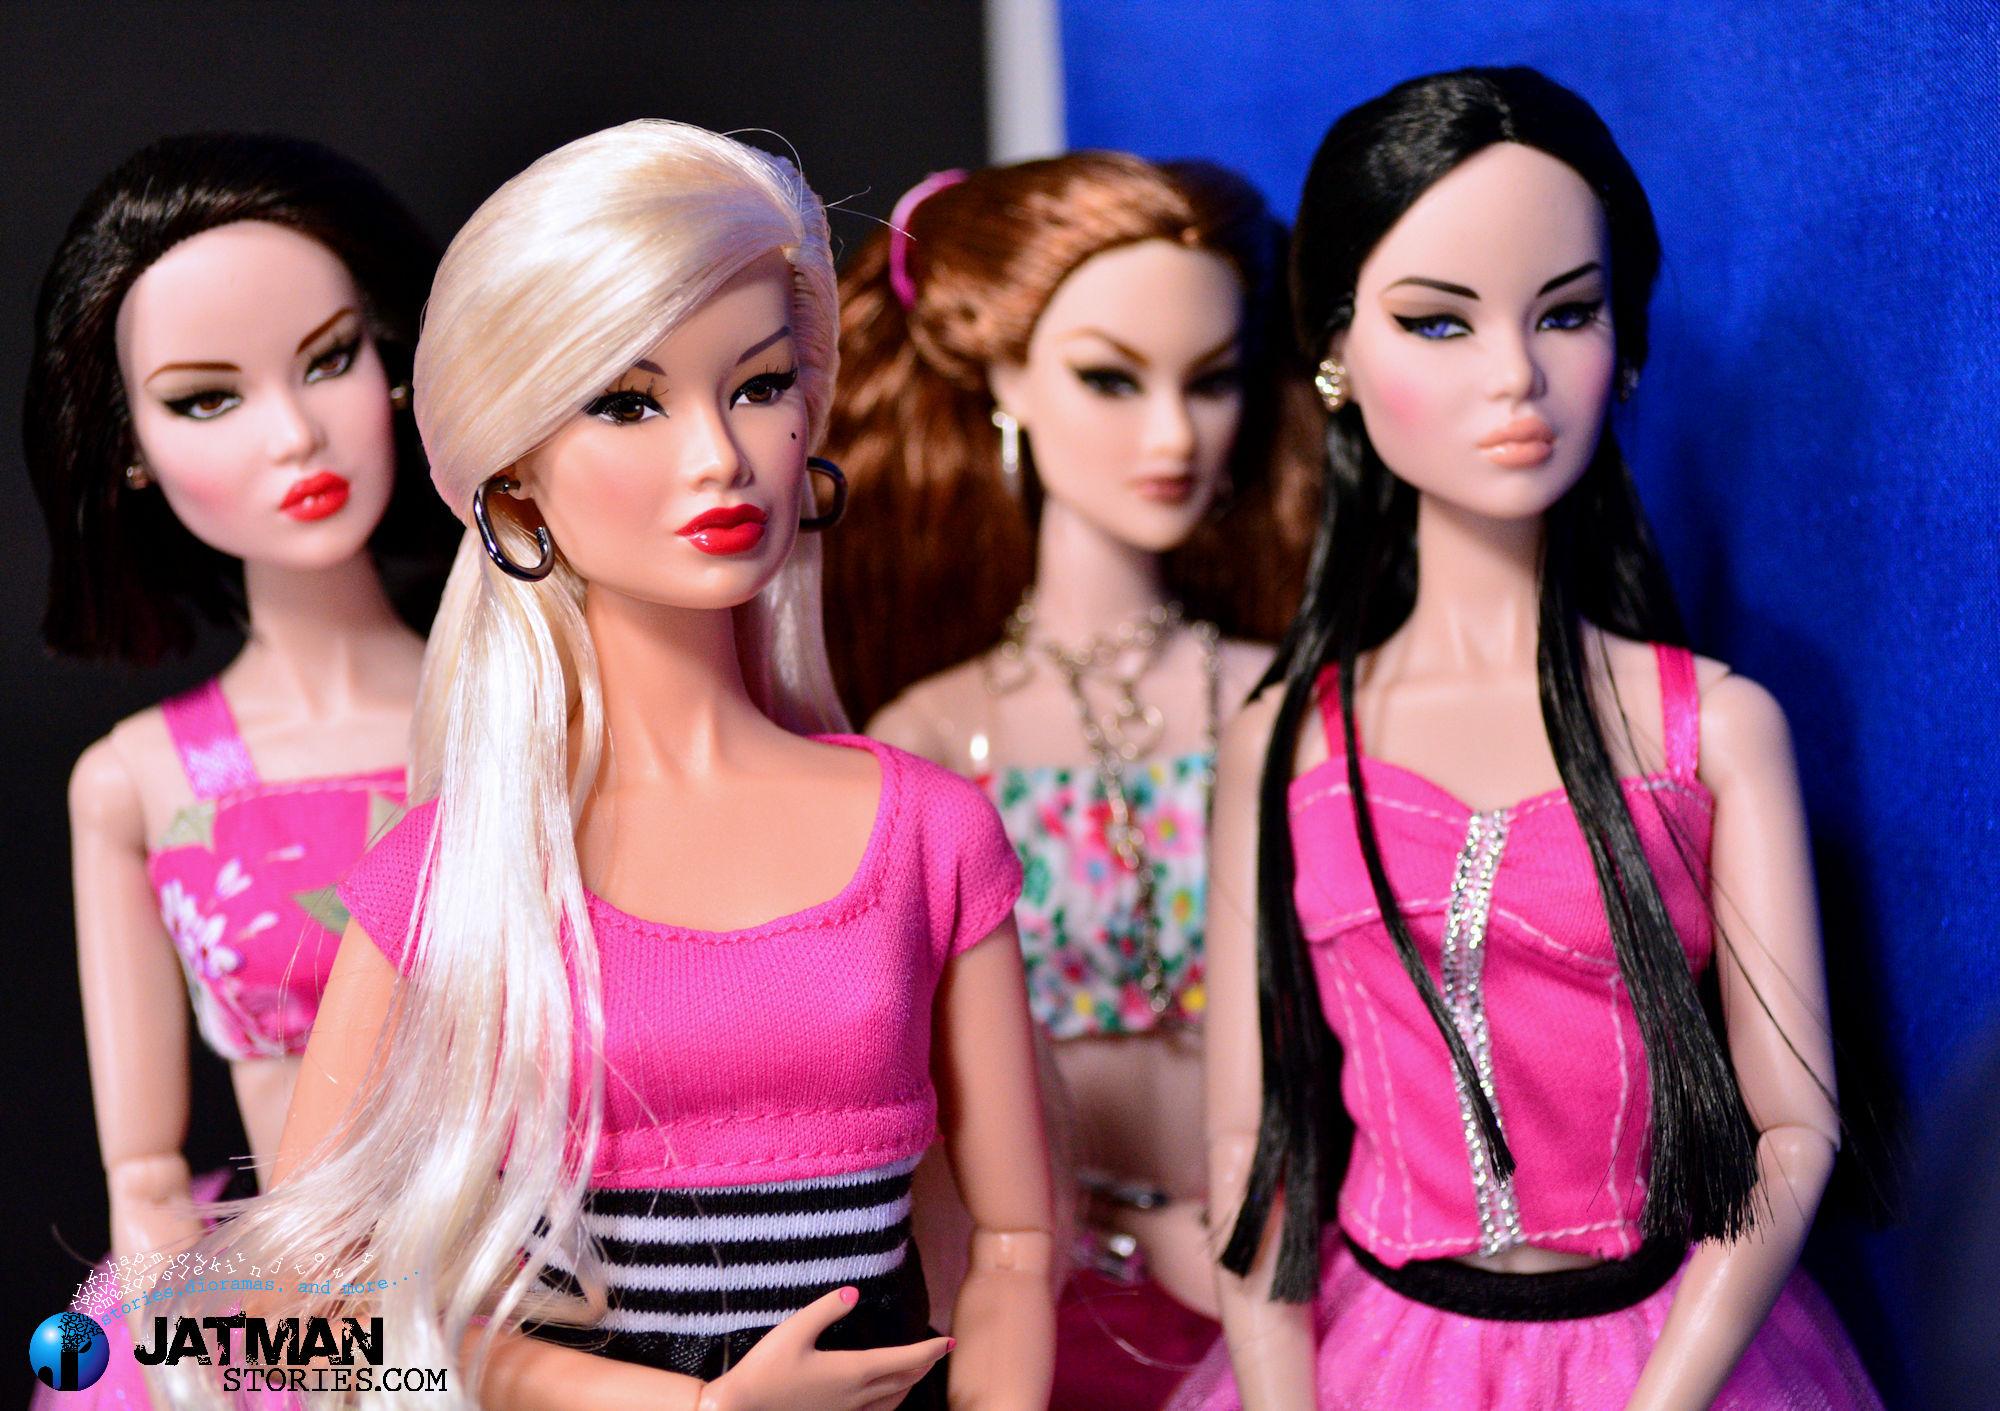 Masaustu Moda Koreli Pembe Oyuncak Bebek Barbie Kiz Kpop